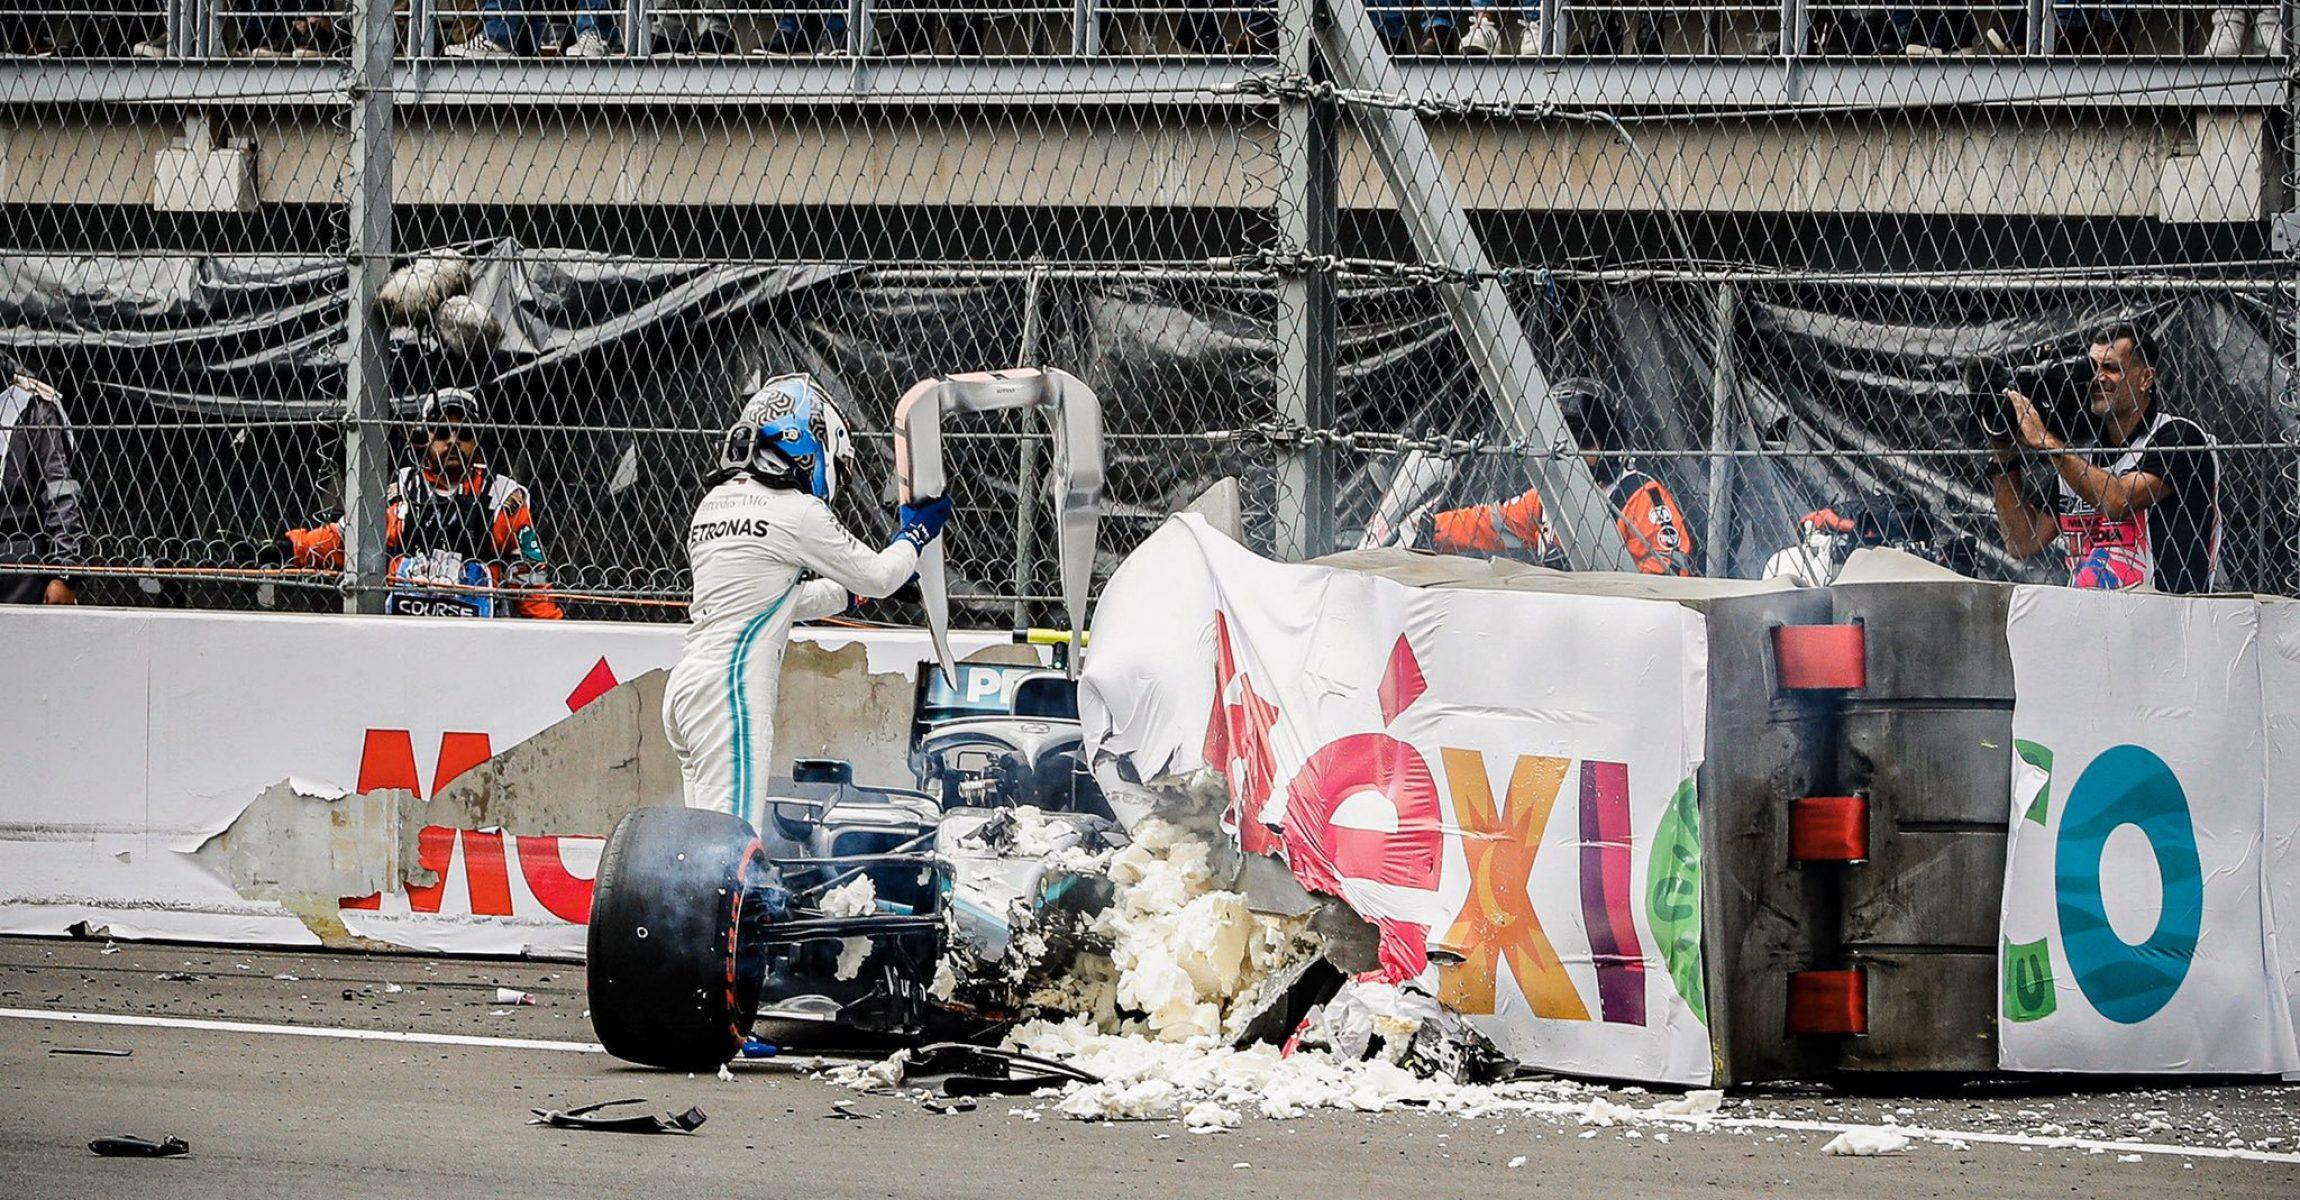 Valtteri Bottas Crash, Mercedes